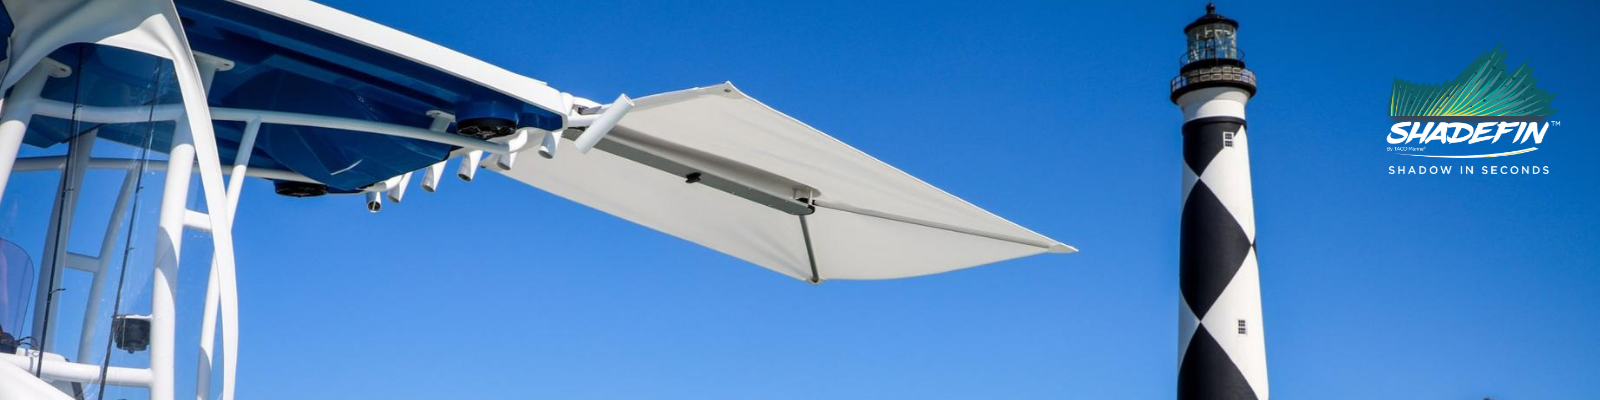 canvas-shade-boat-shade-t10-3000